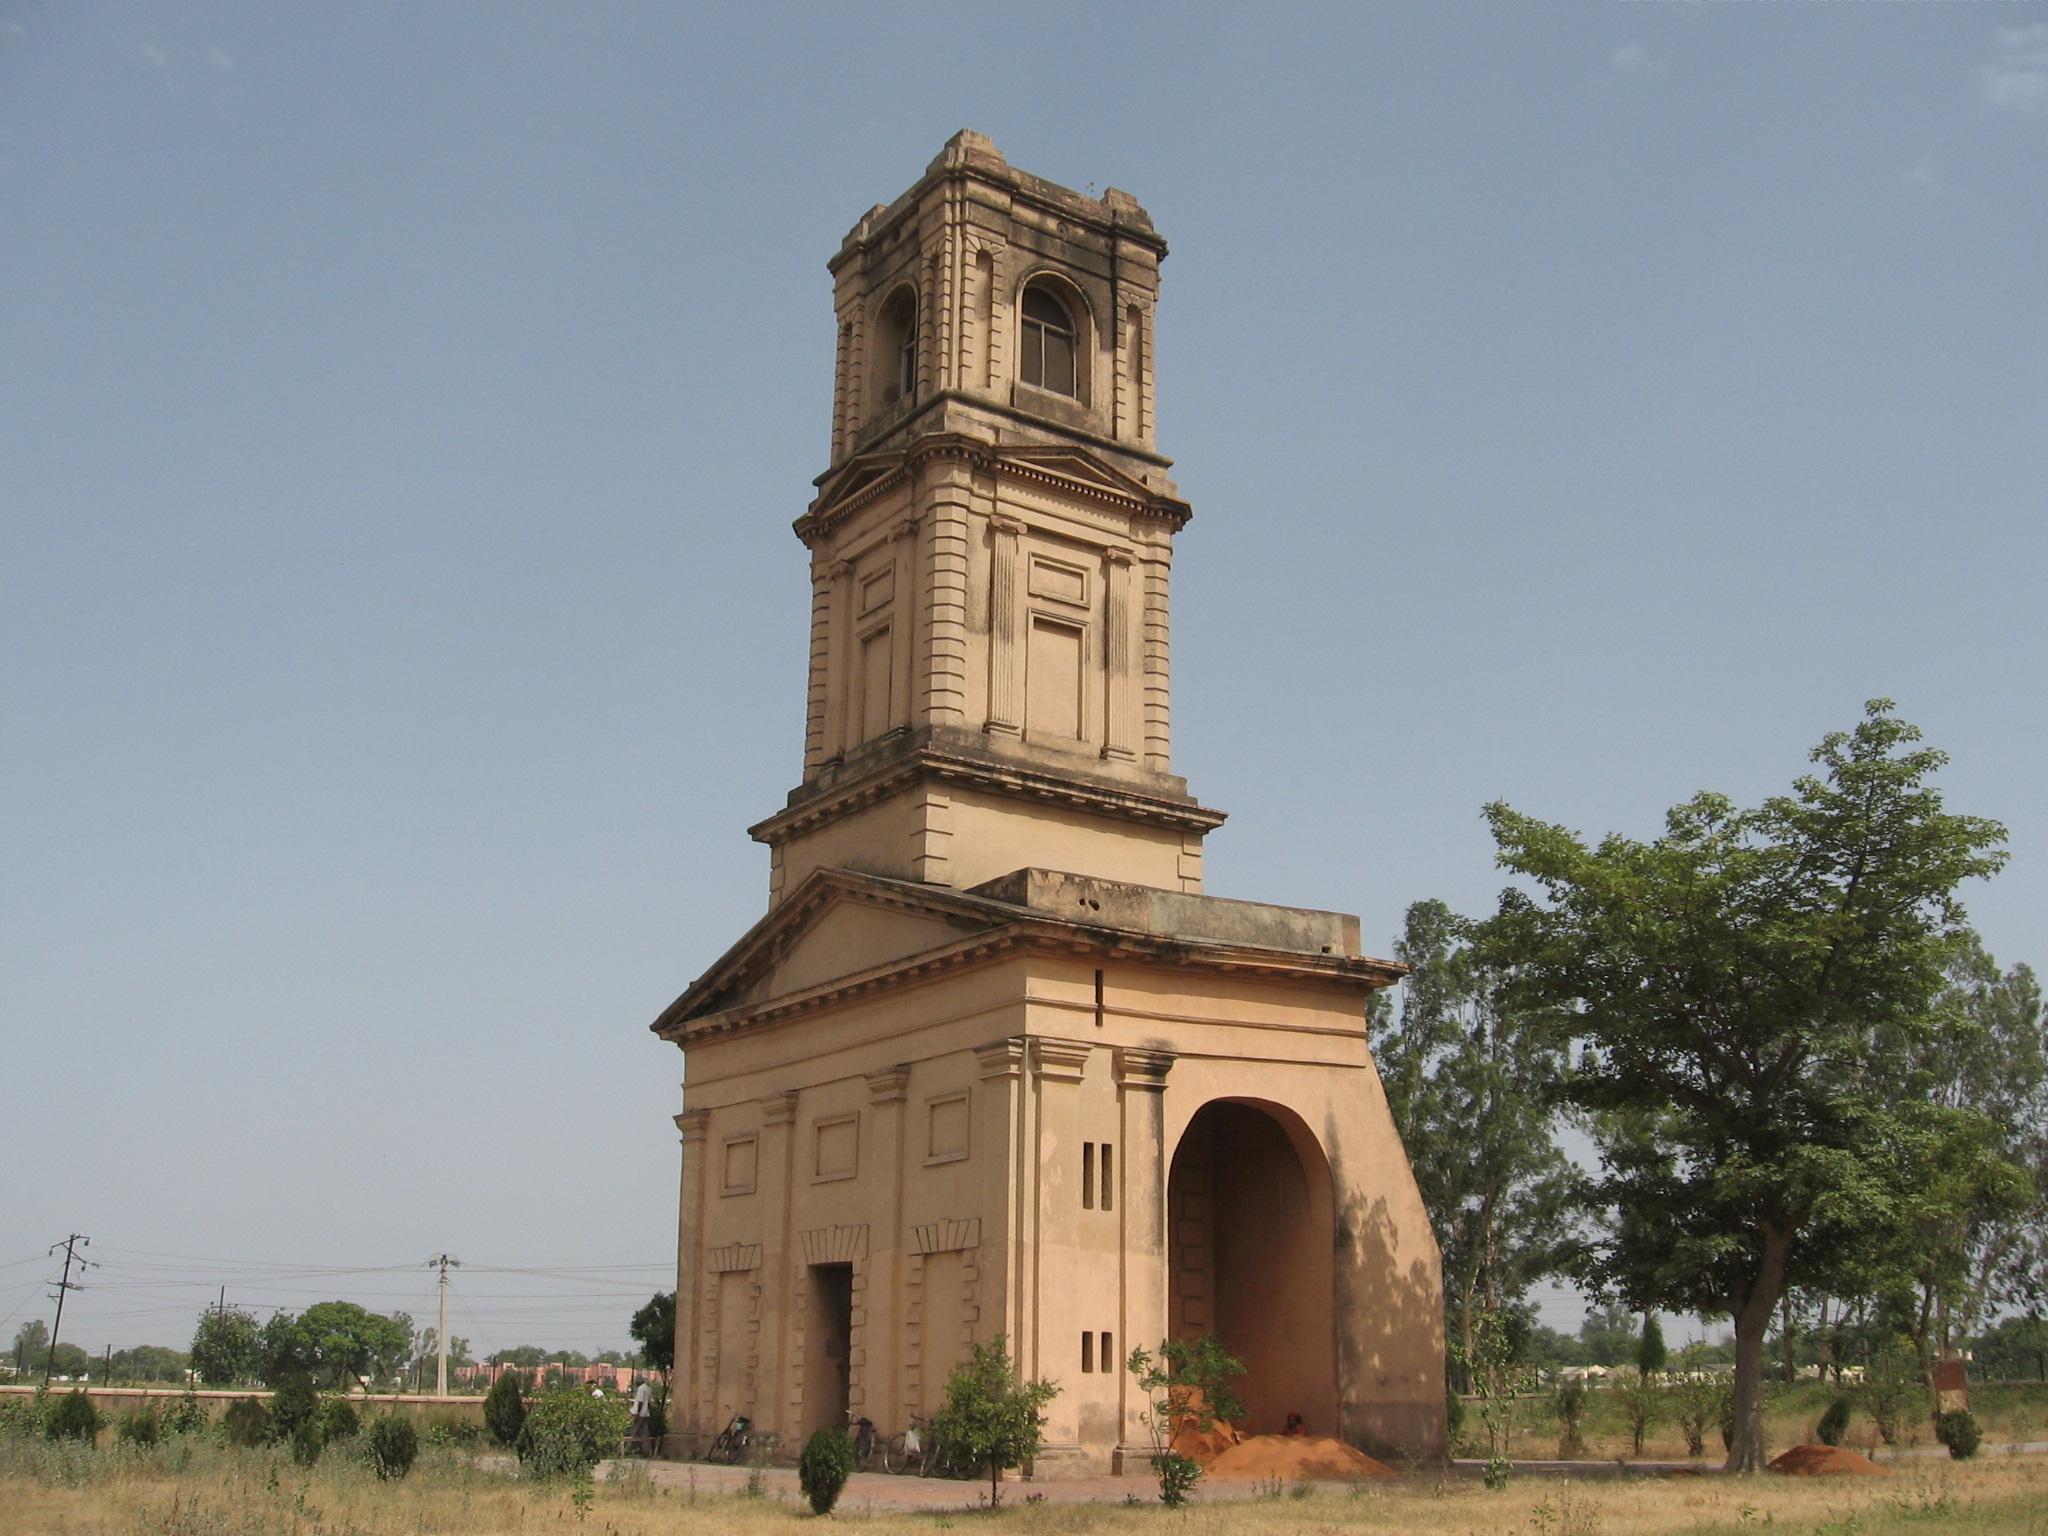 Cantonment Church Tower - Karnal Image